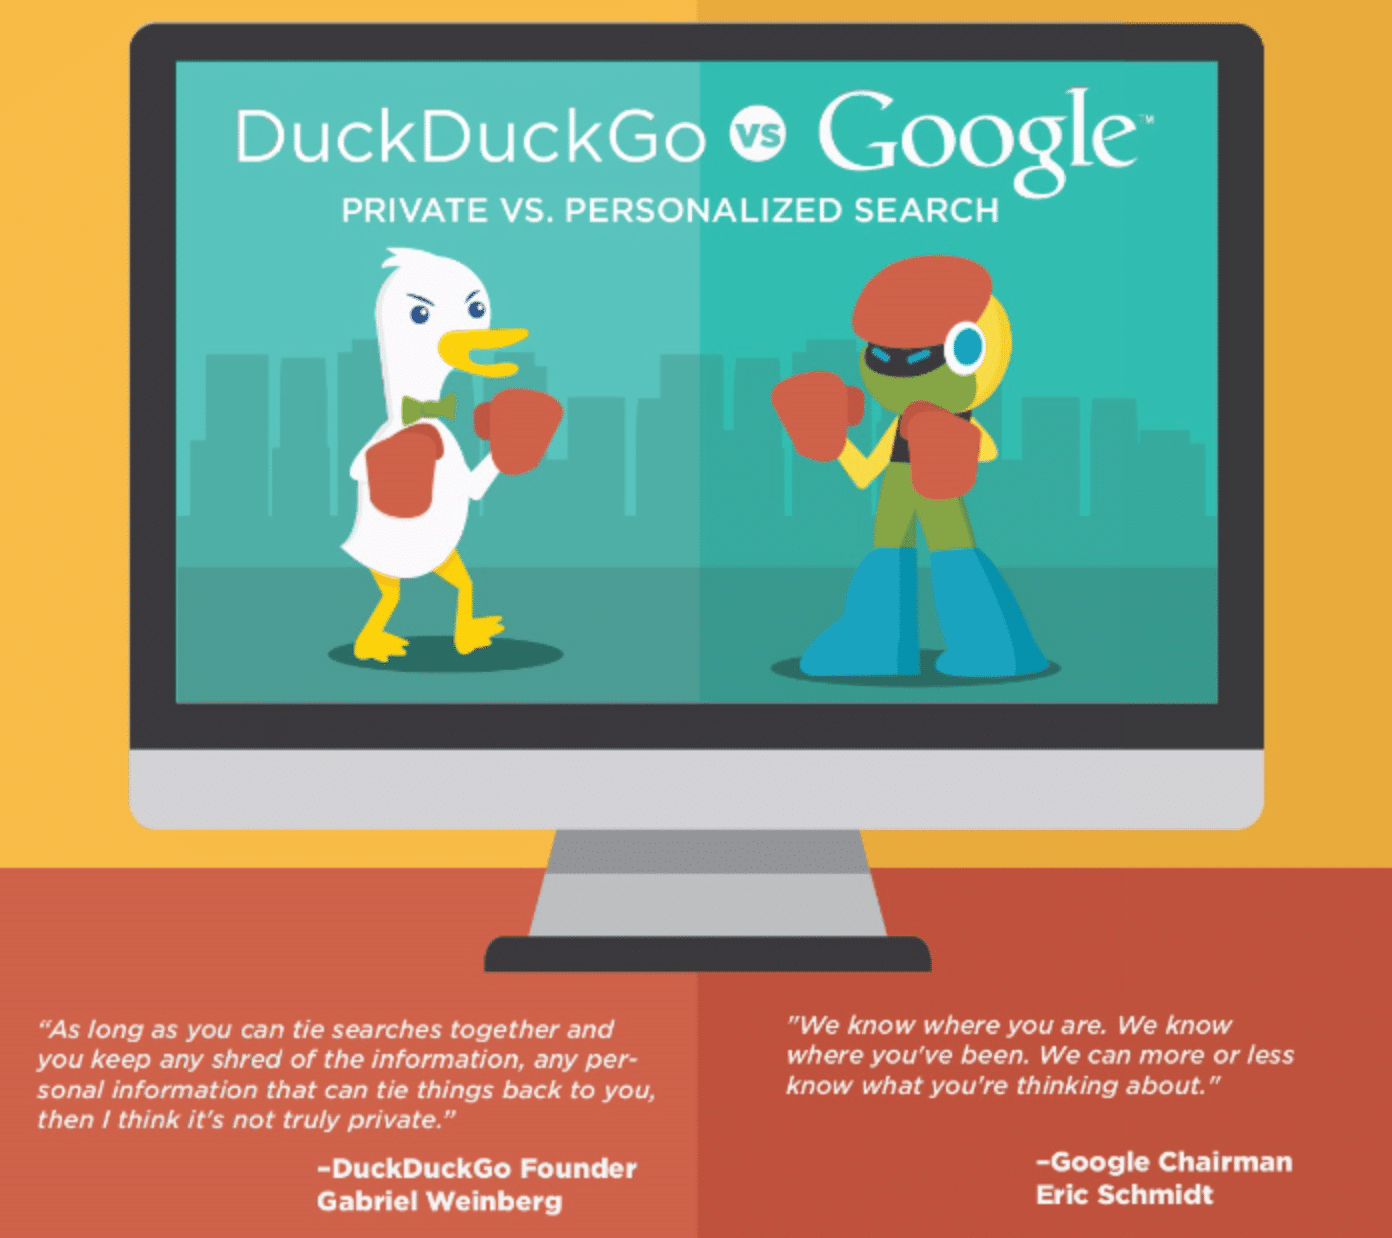 DuckDuckGo-Google-Search-1